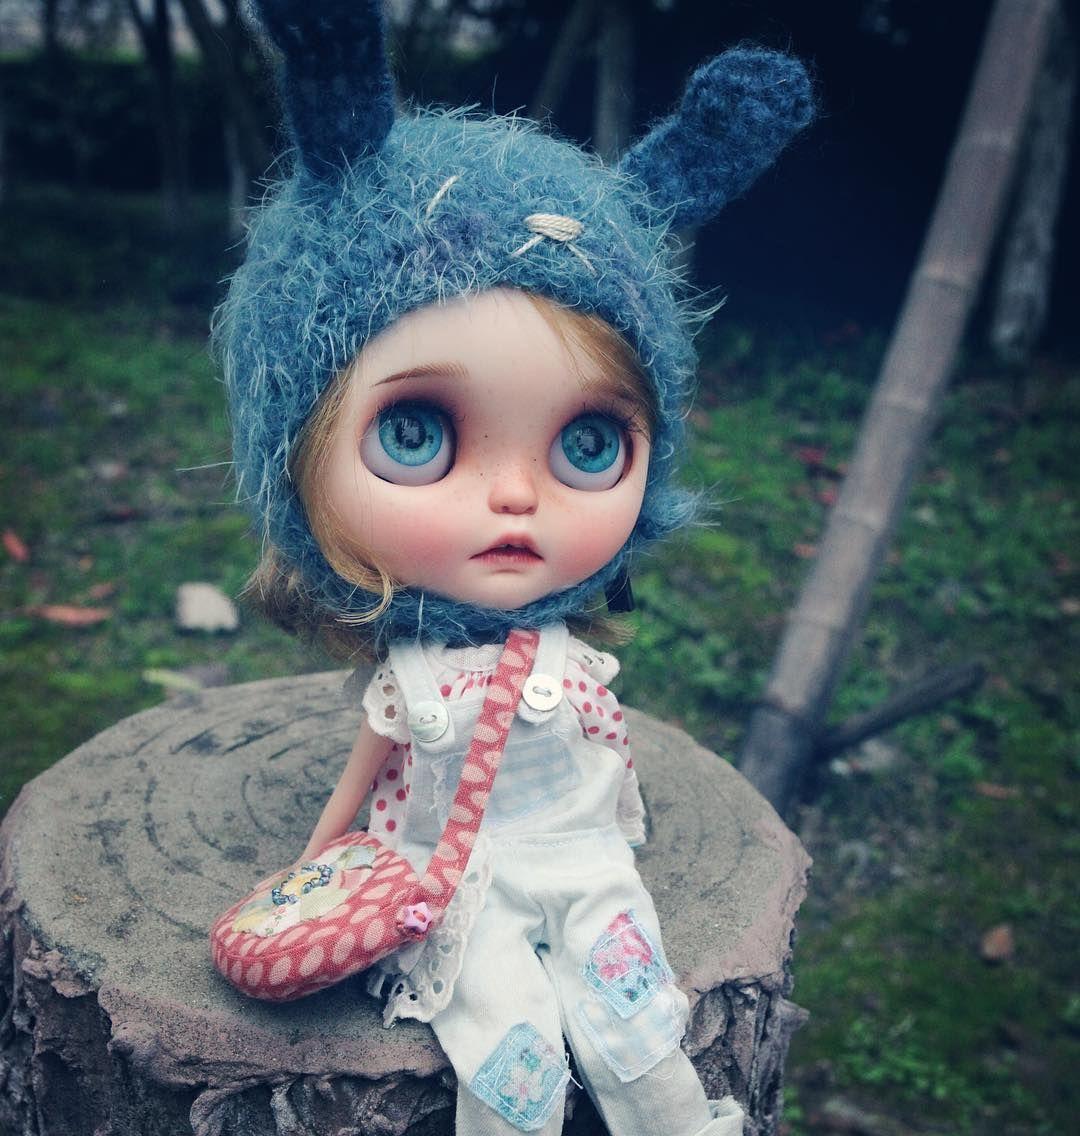 #NickyLad #rbl #blythe #blythecustom #doll #wanwan #wanwandoll